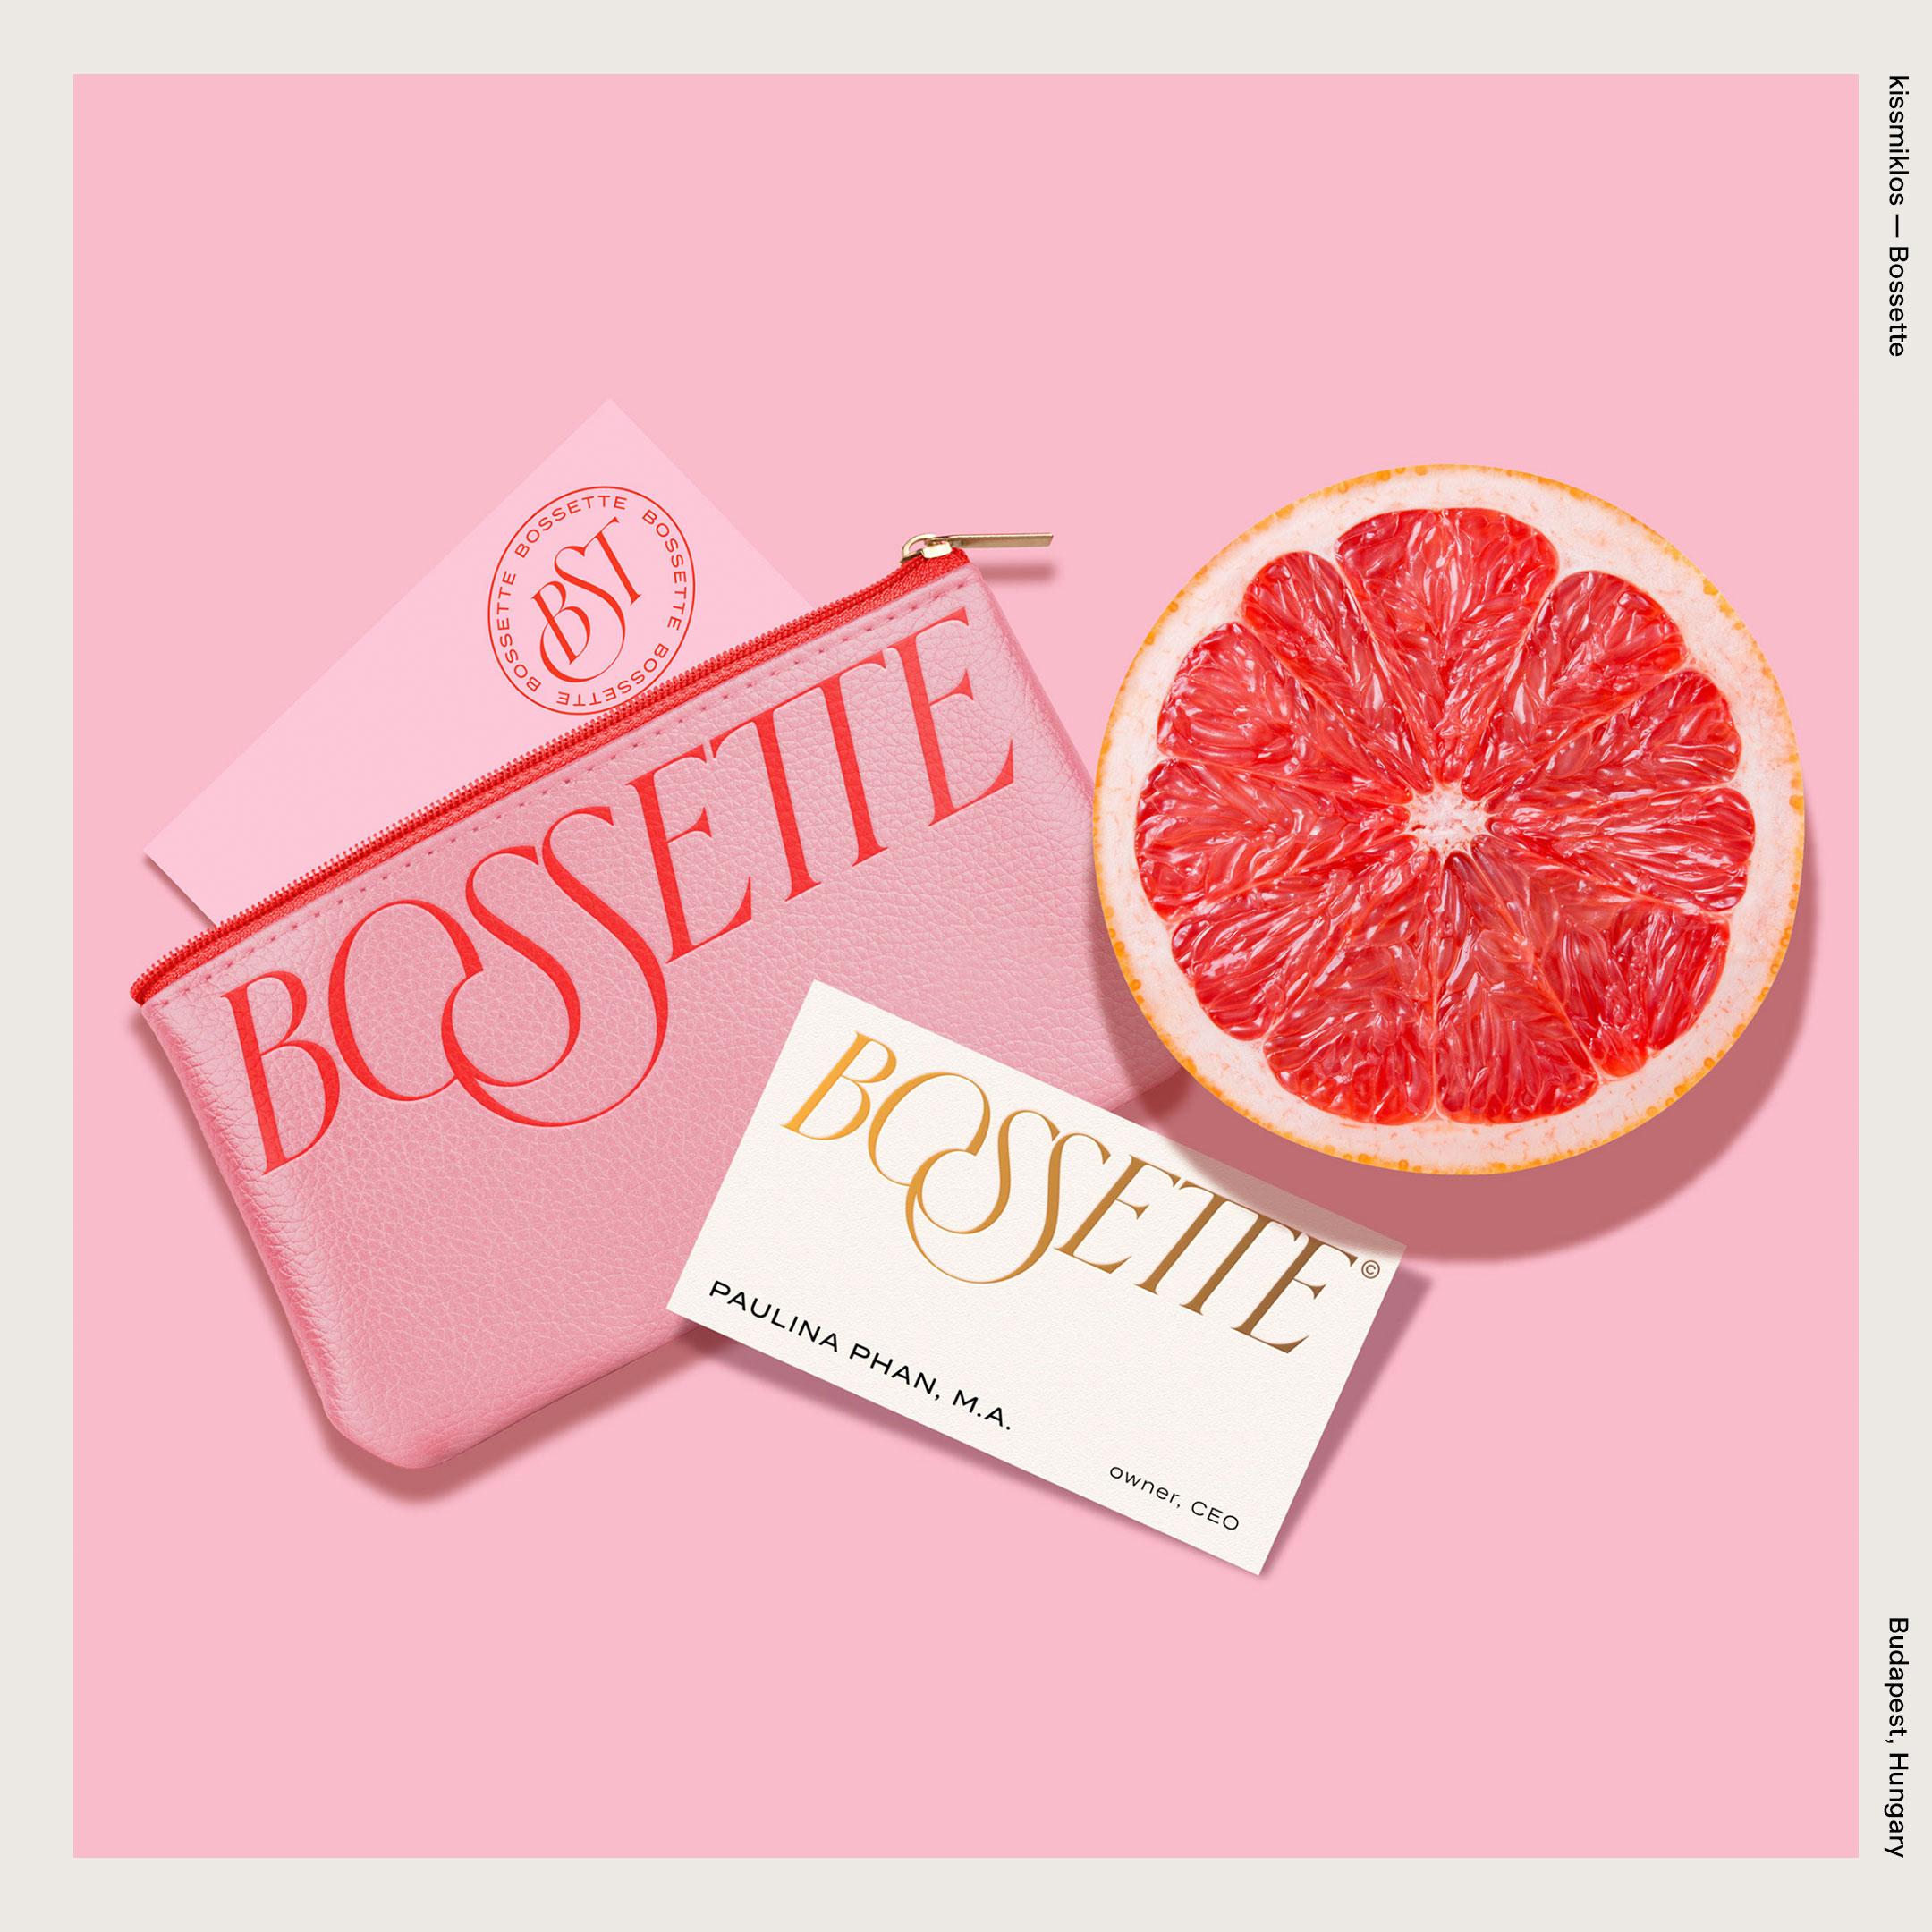 kissmiklos — Bossette